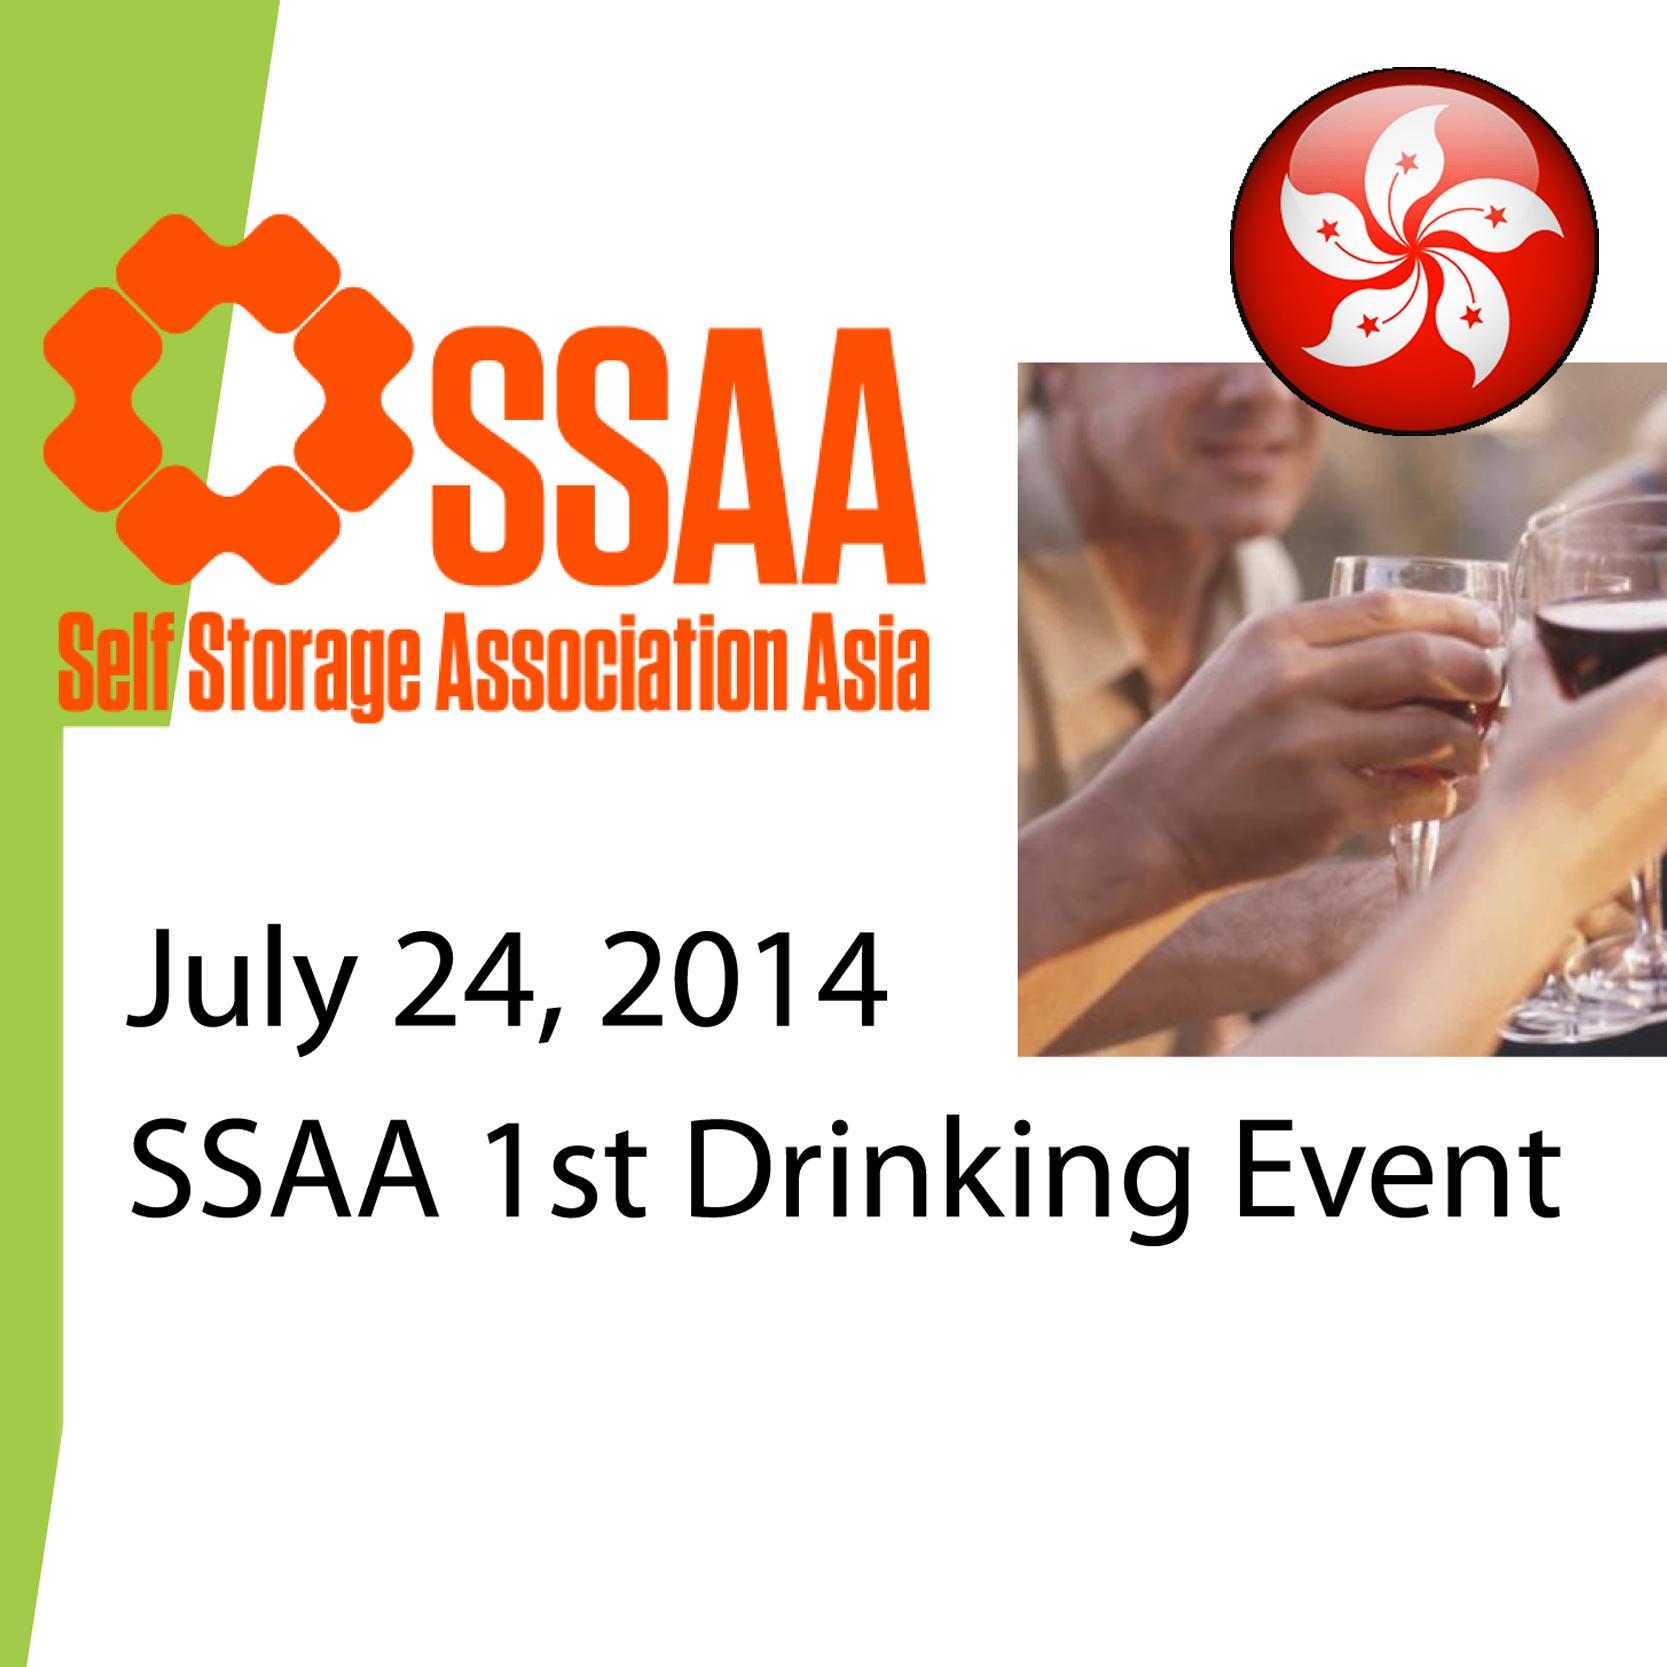 Jul 24 - 1st Networking Drinks in Hong Kong